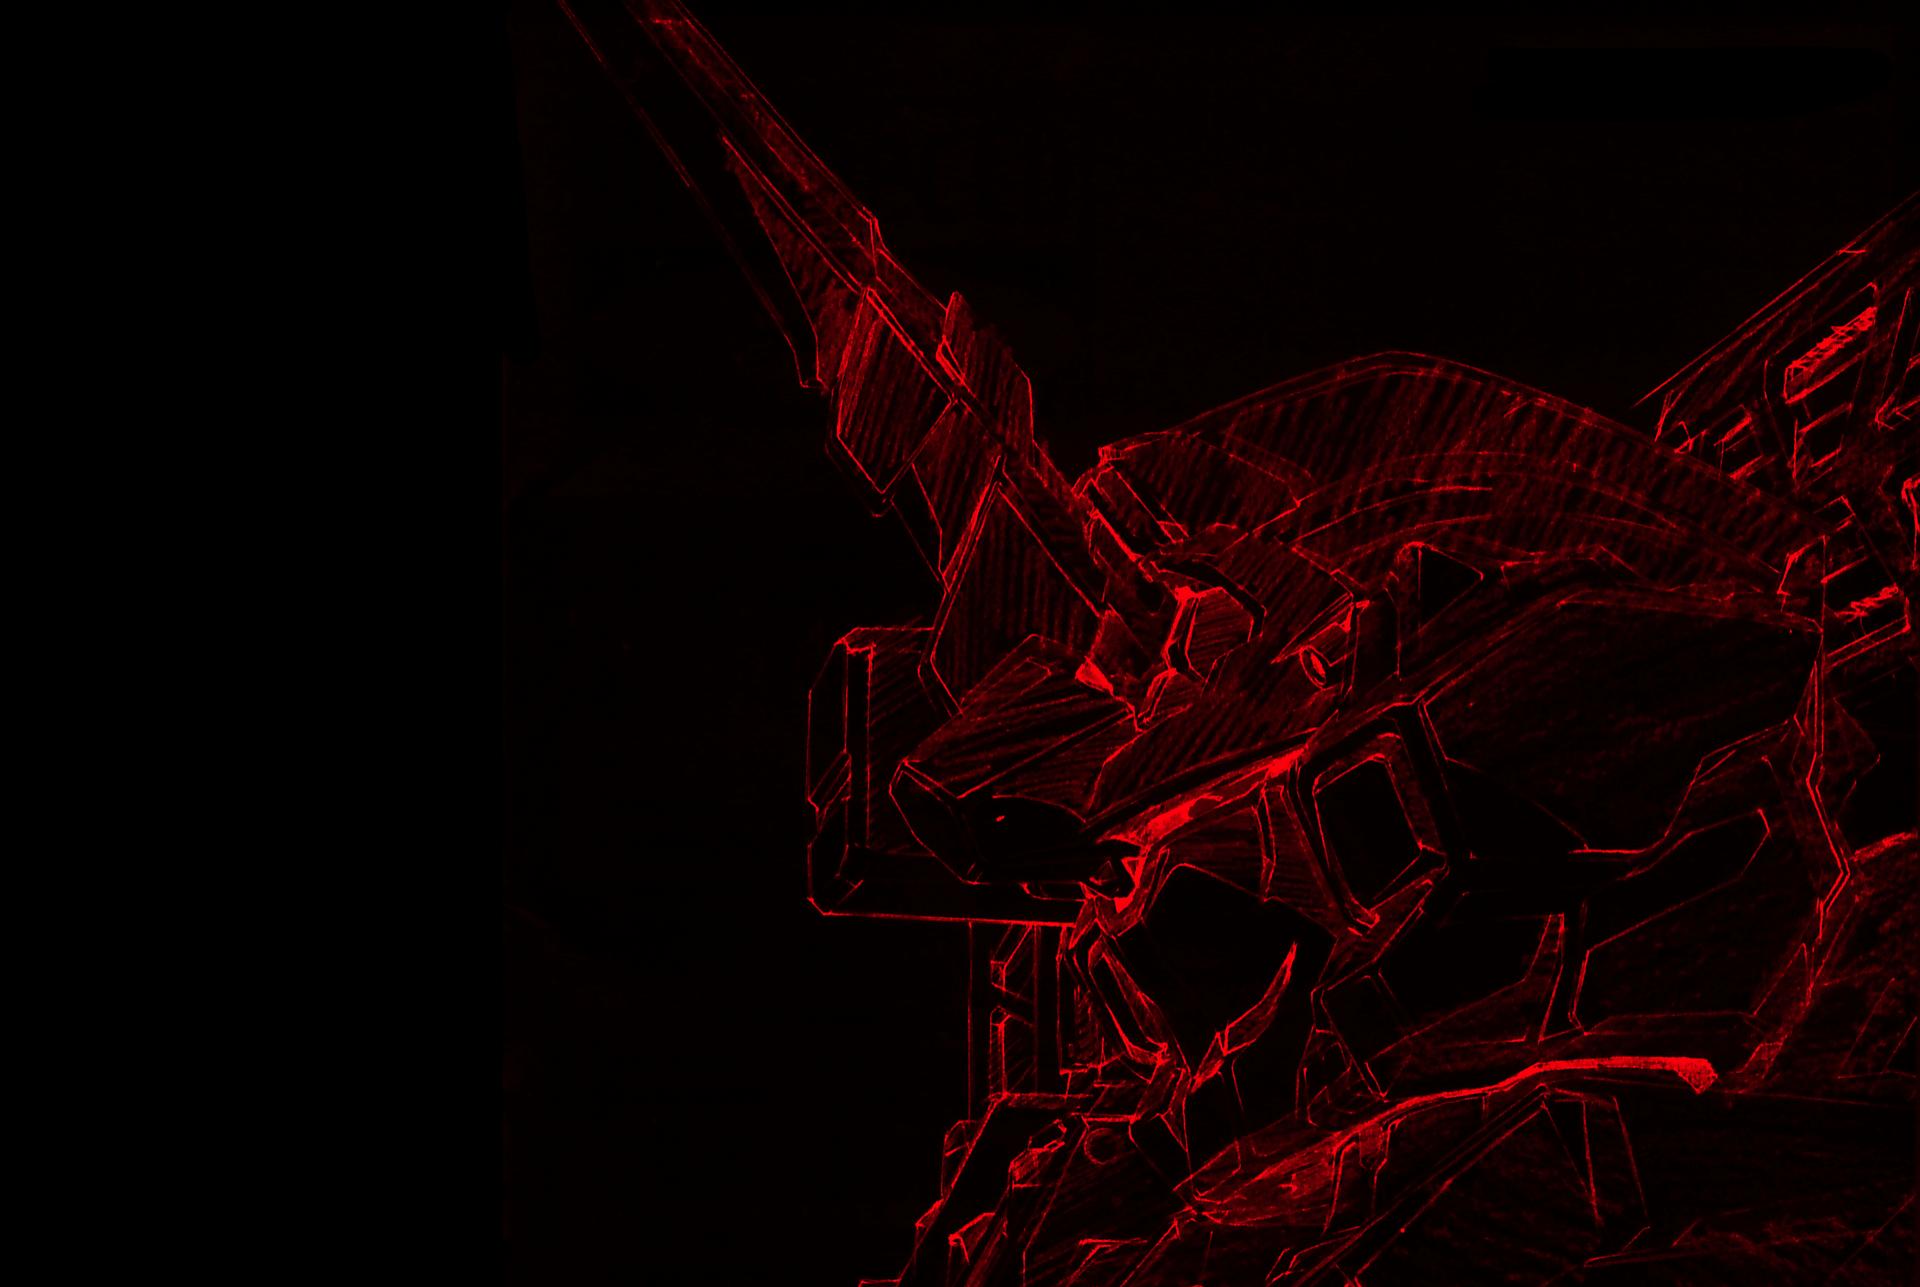 Mobile suit gundam unicorn gundam anime wallpaper 105032 download wallpaper voltagebd Images